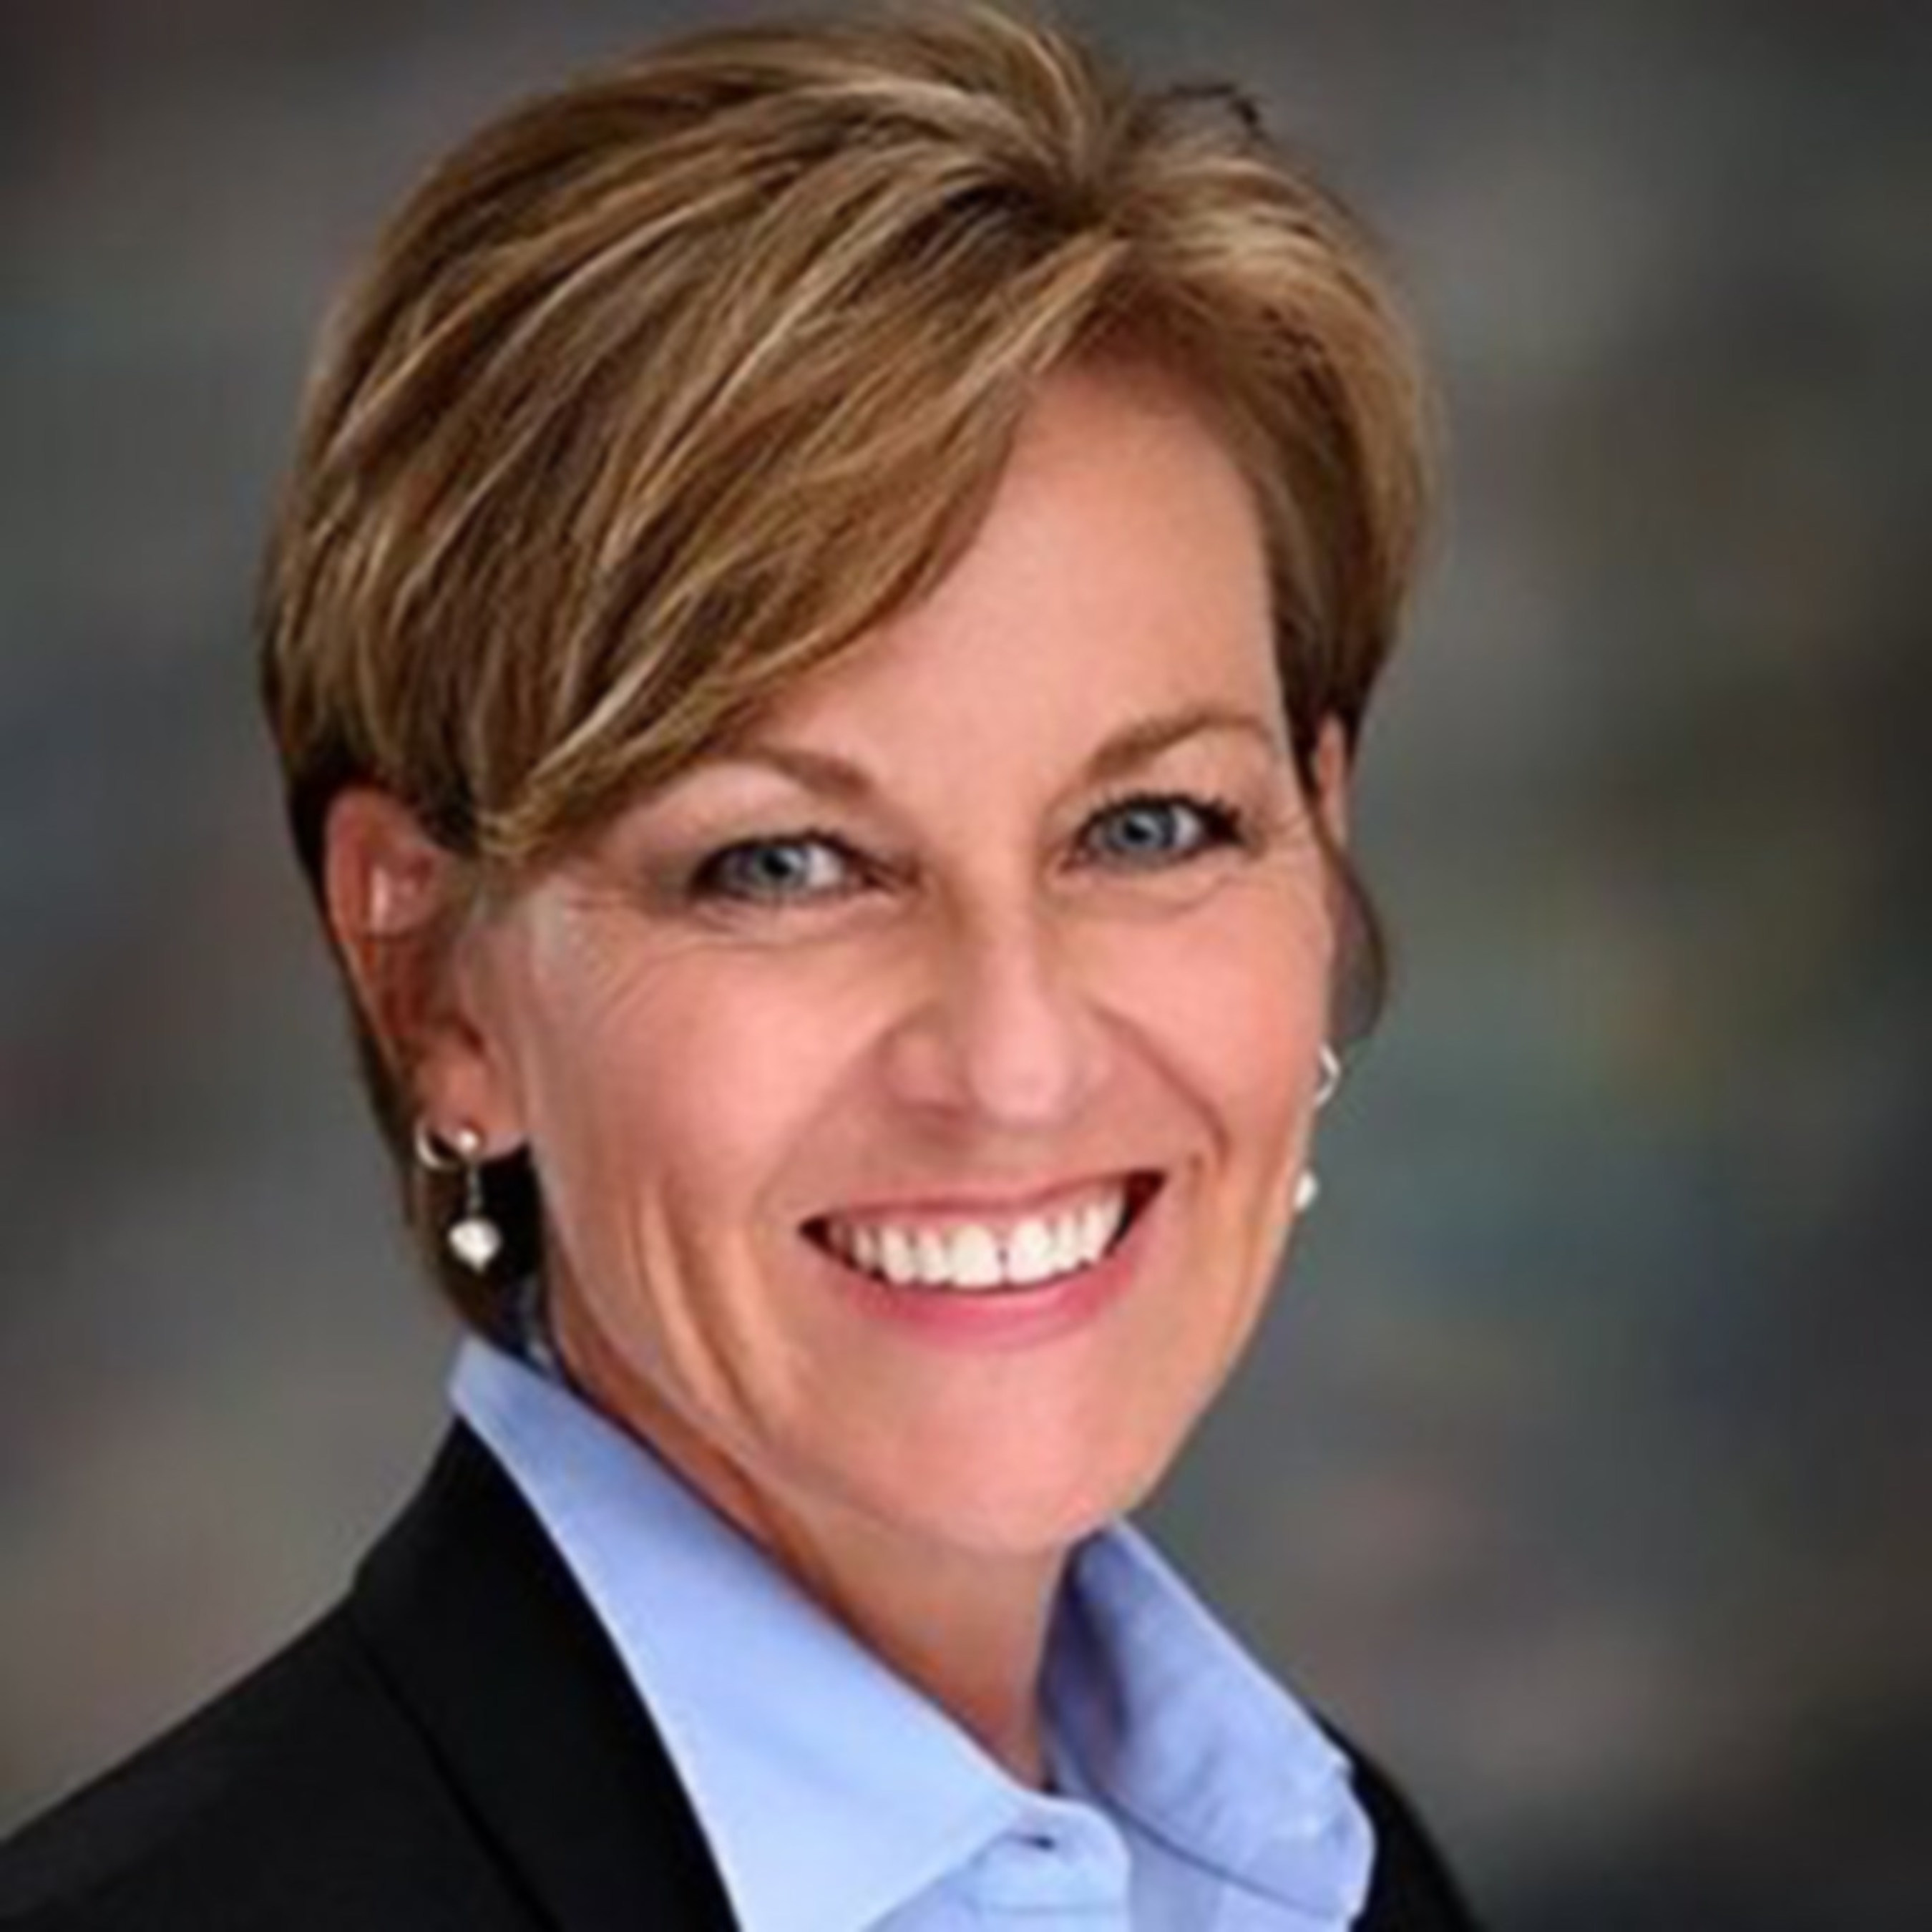 NSM Insurance Group Announces New Director Of Production, Kaycie Berley